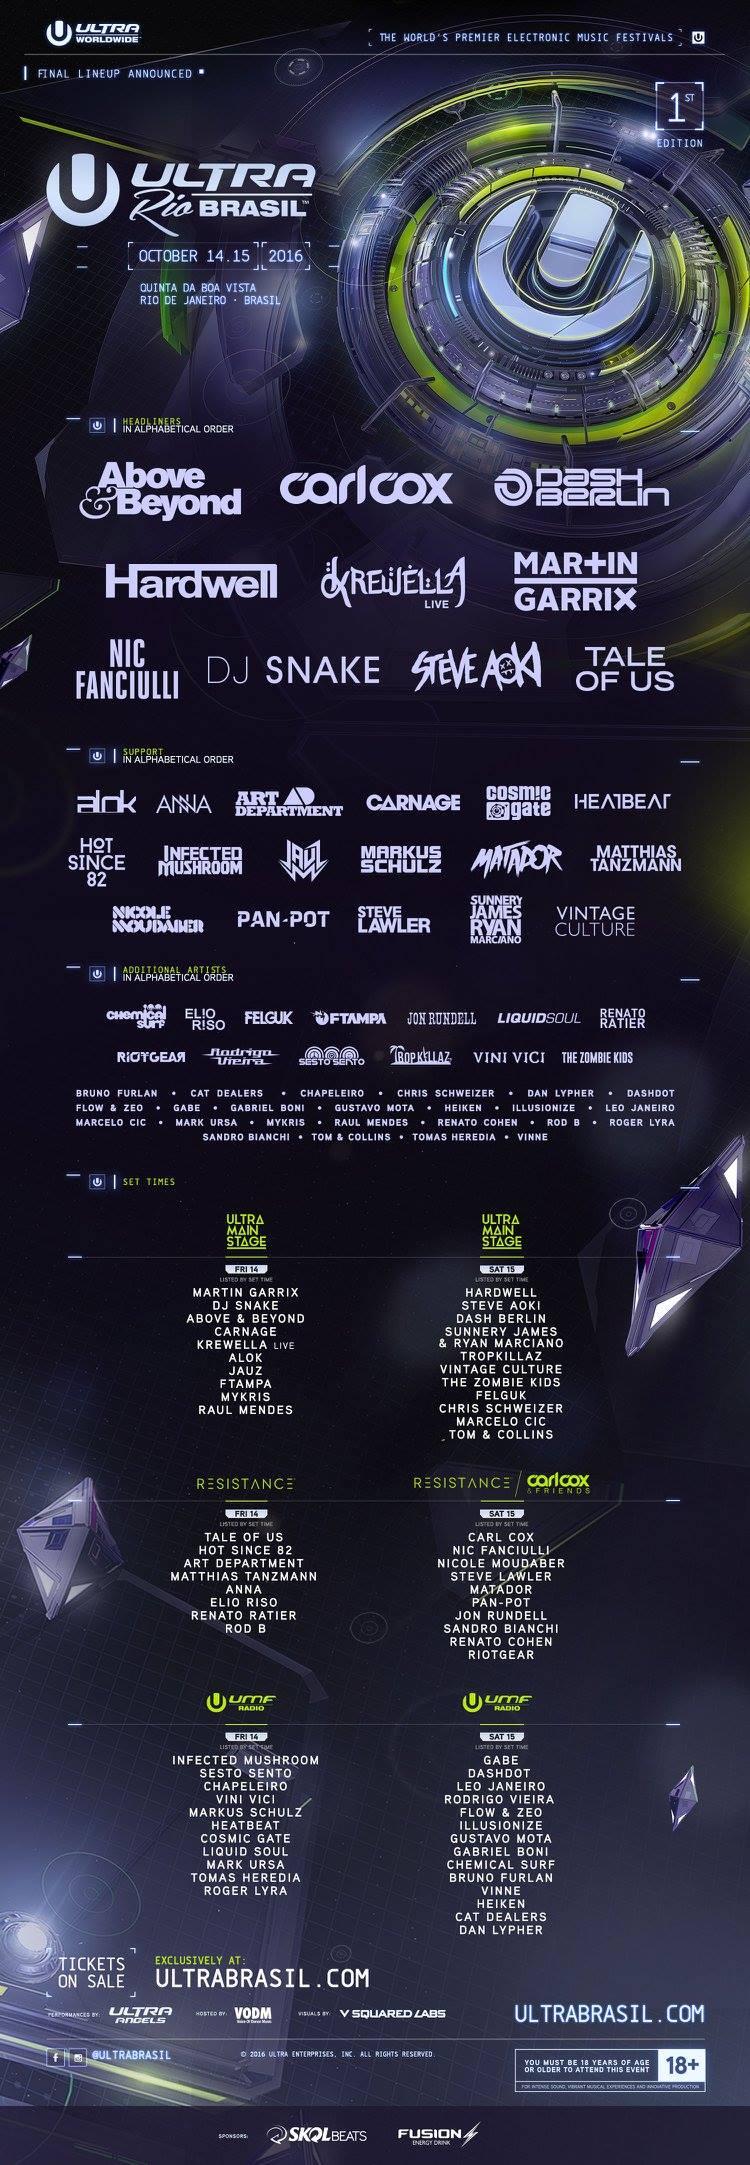 ultra-brasil-2016-lineup